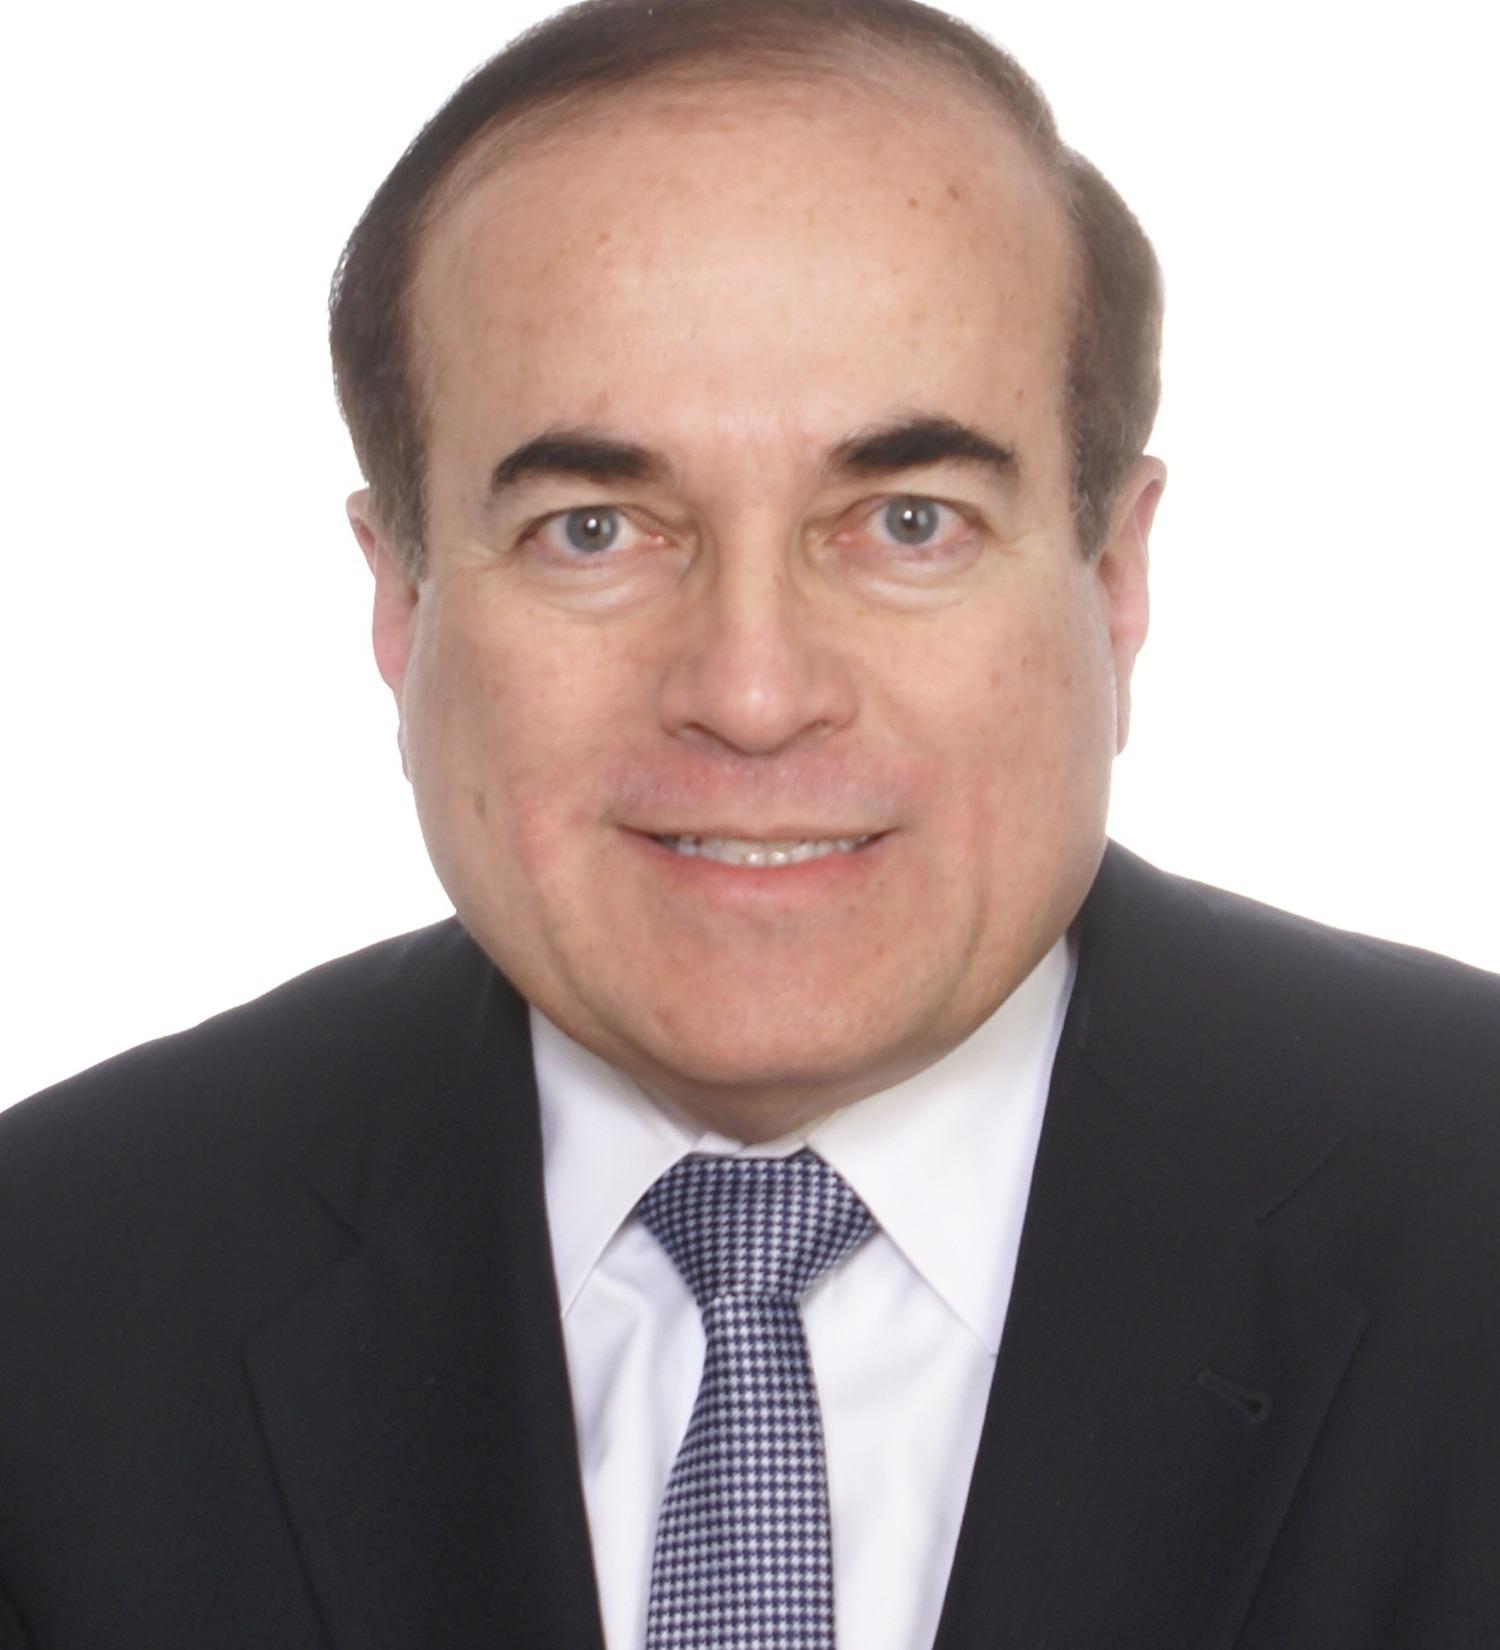 Steven H. Jesser